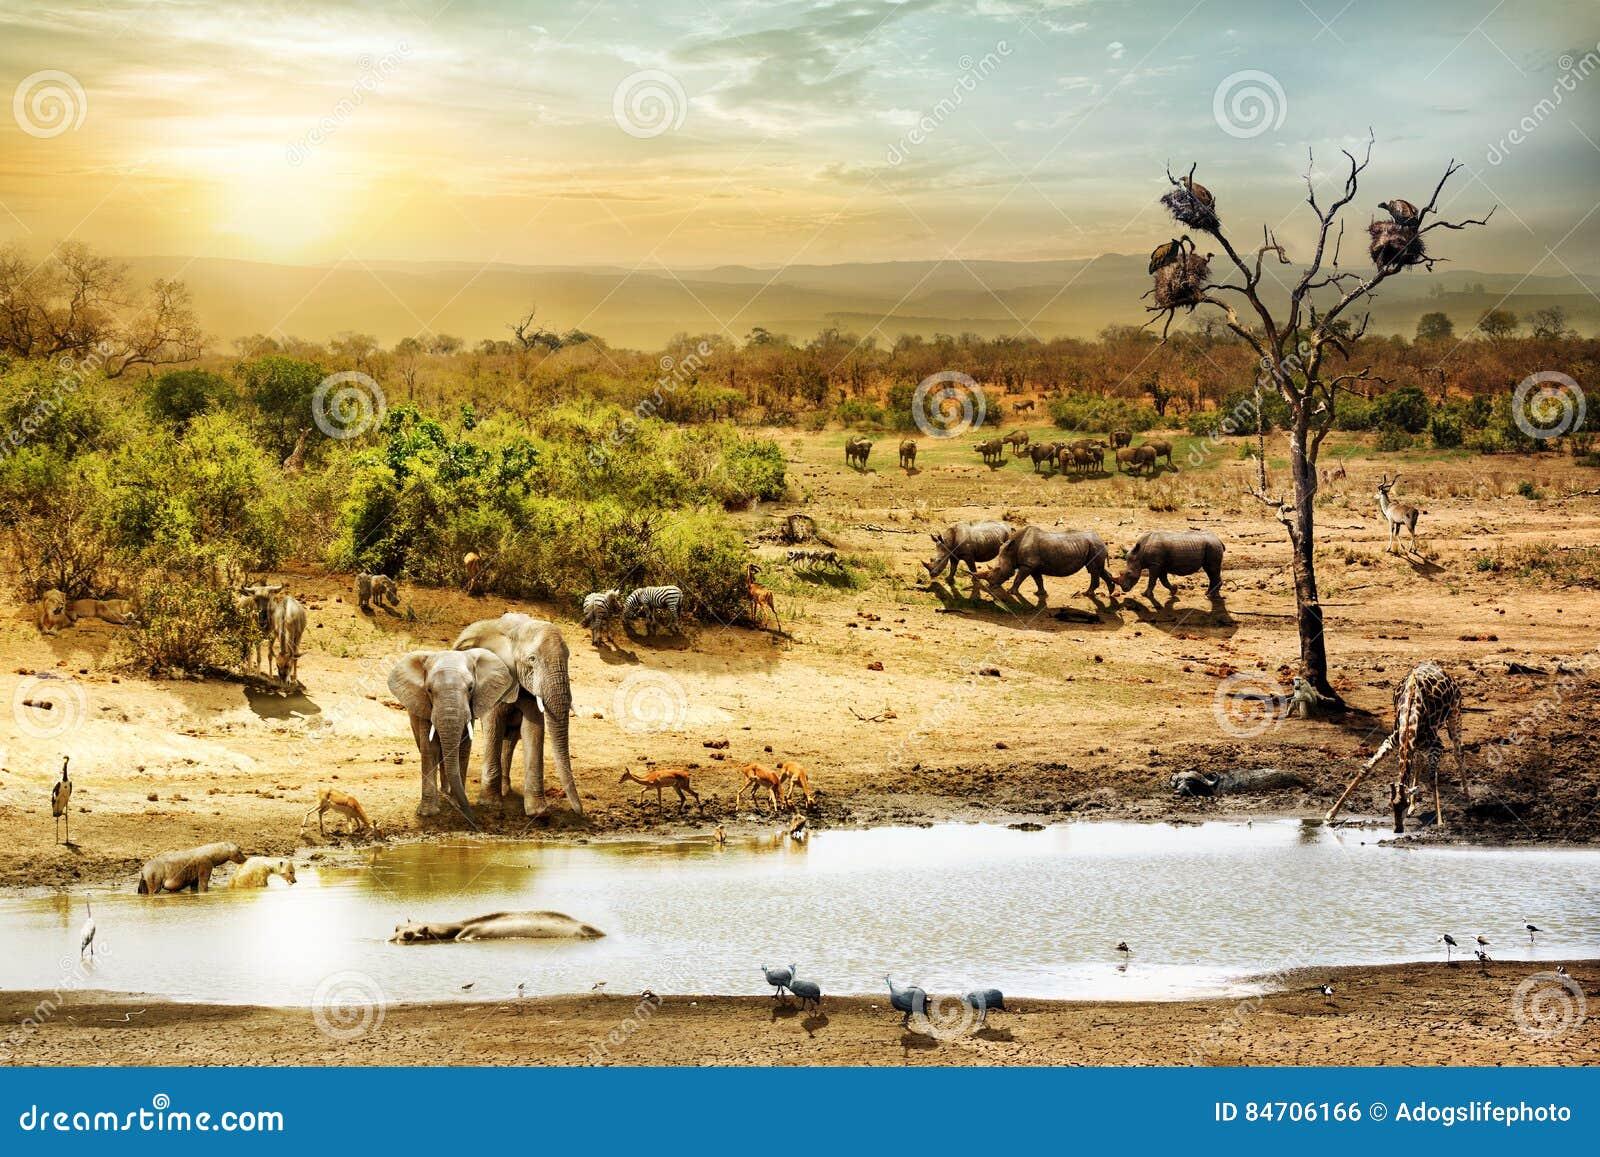 Zuidafrikaanse Safari Wildlife Fantasy Scene